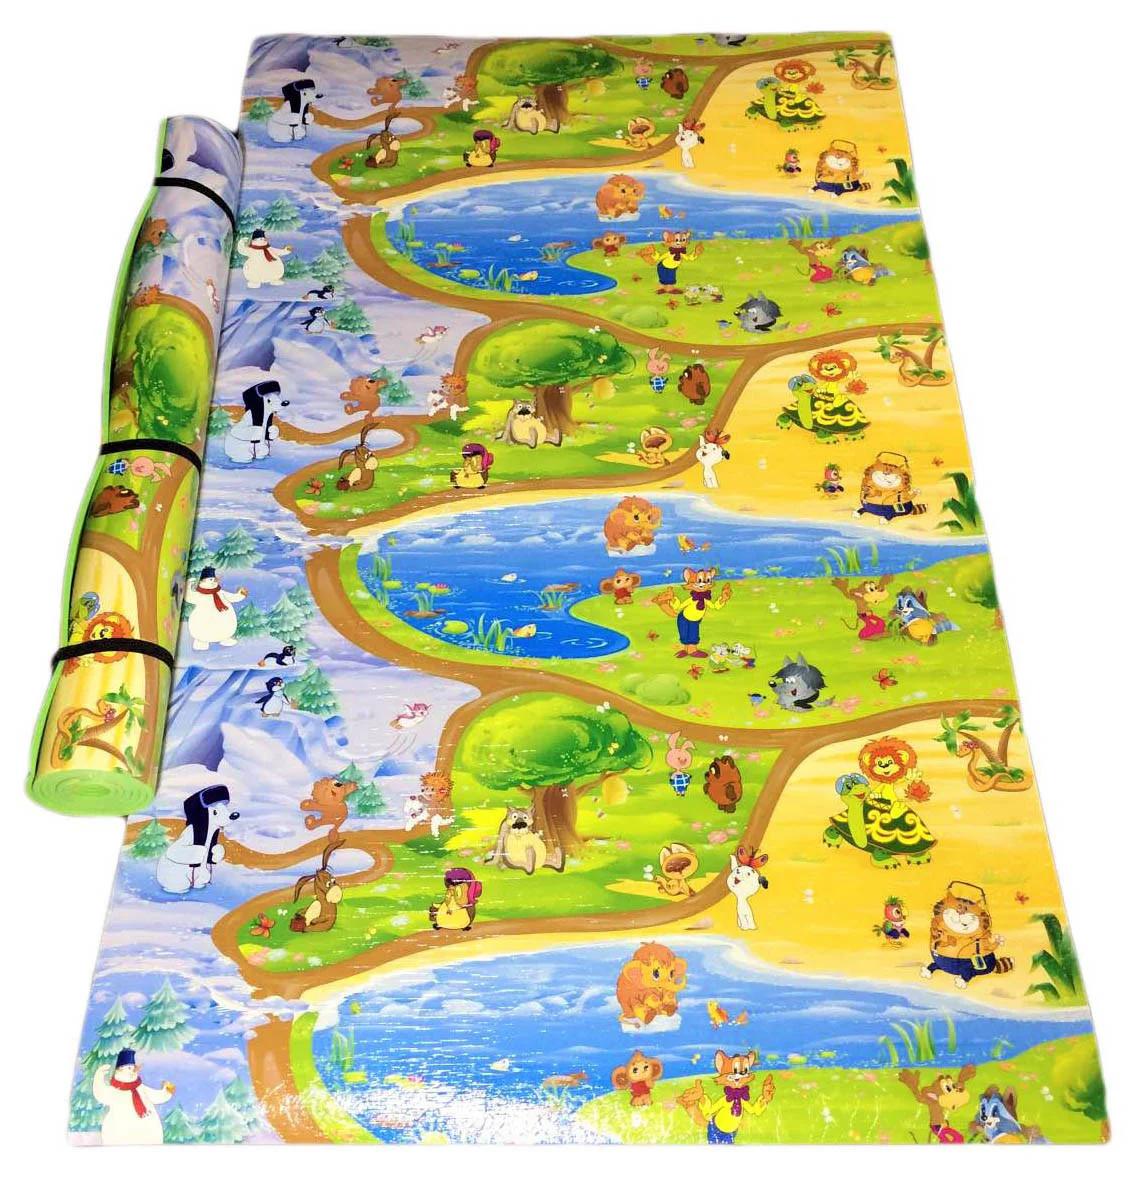 Детский коврик 3000х1200х12мм  теплоизоляционный, развивающий, игровой коврик